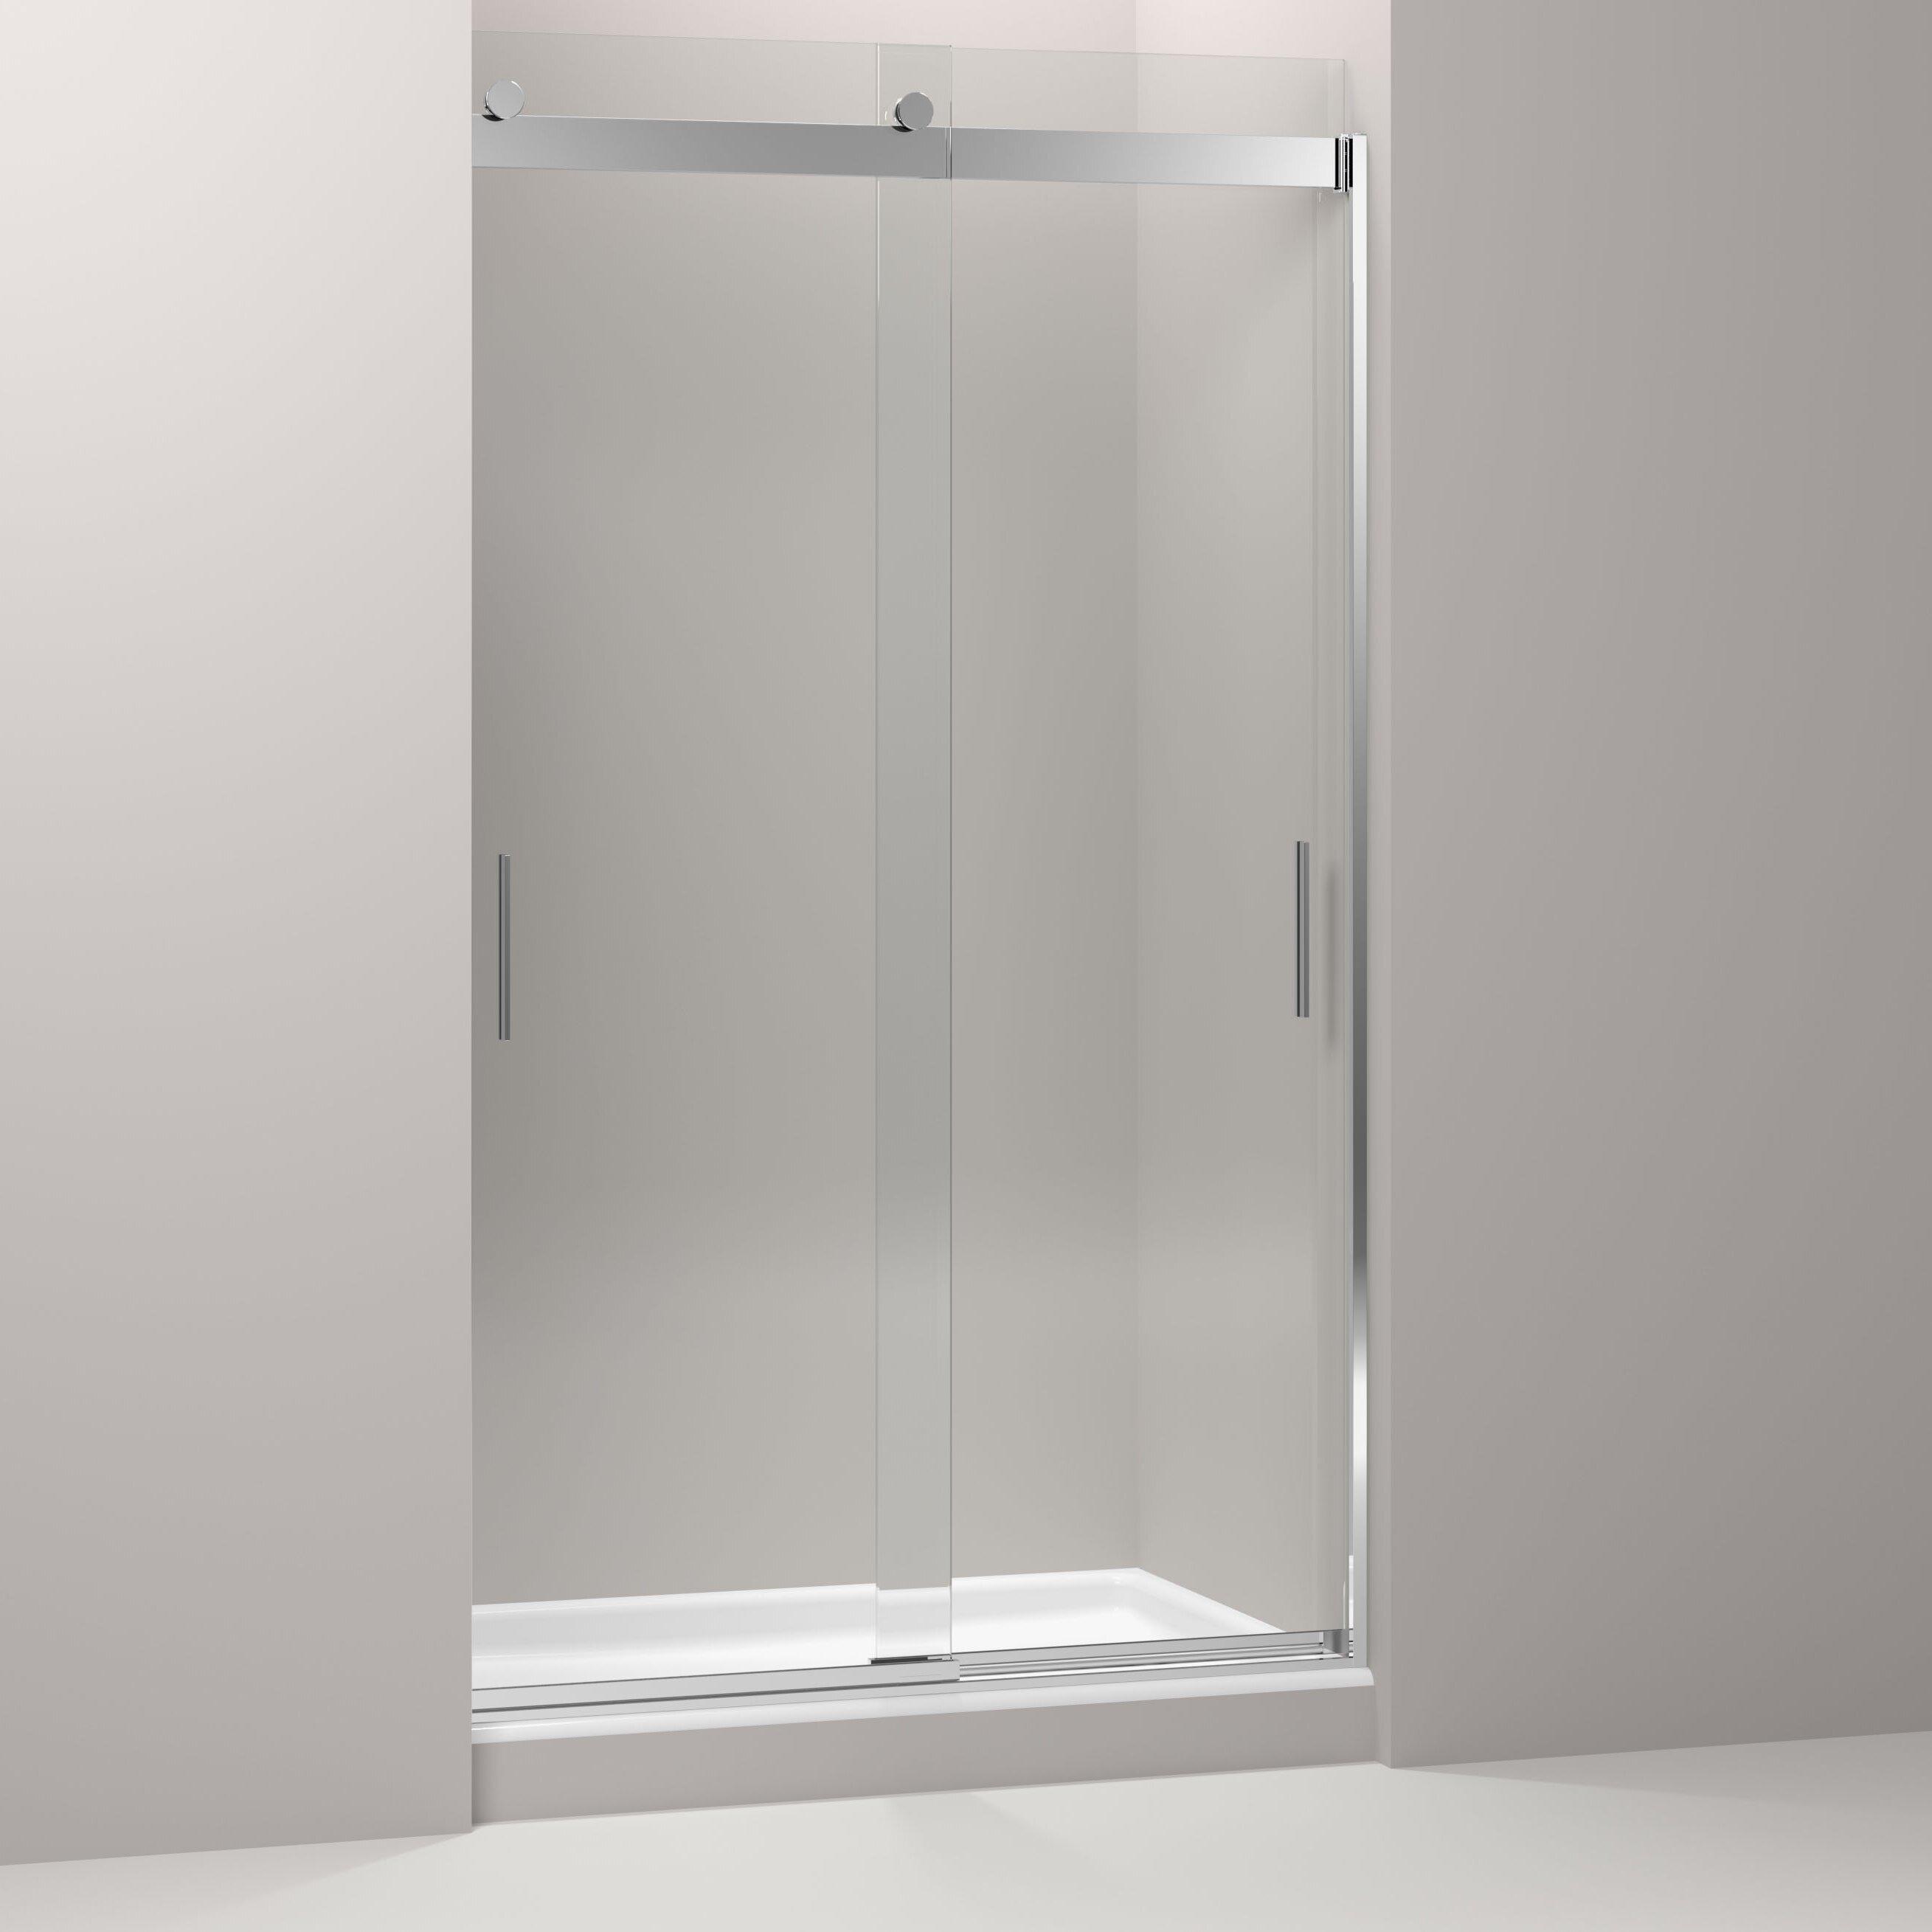 Fascinating Sliding Shower Door Handle Replacement Contemporary ...